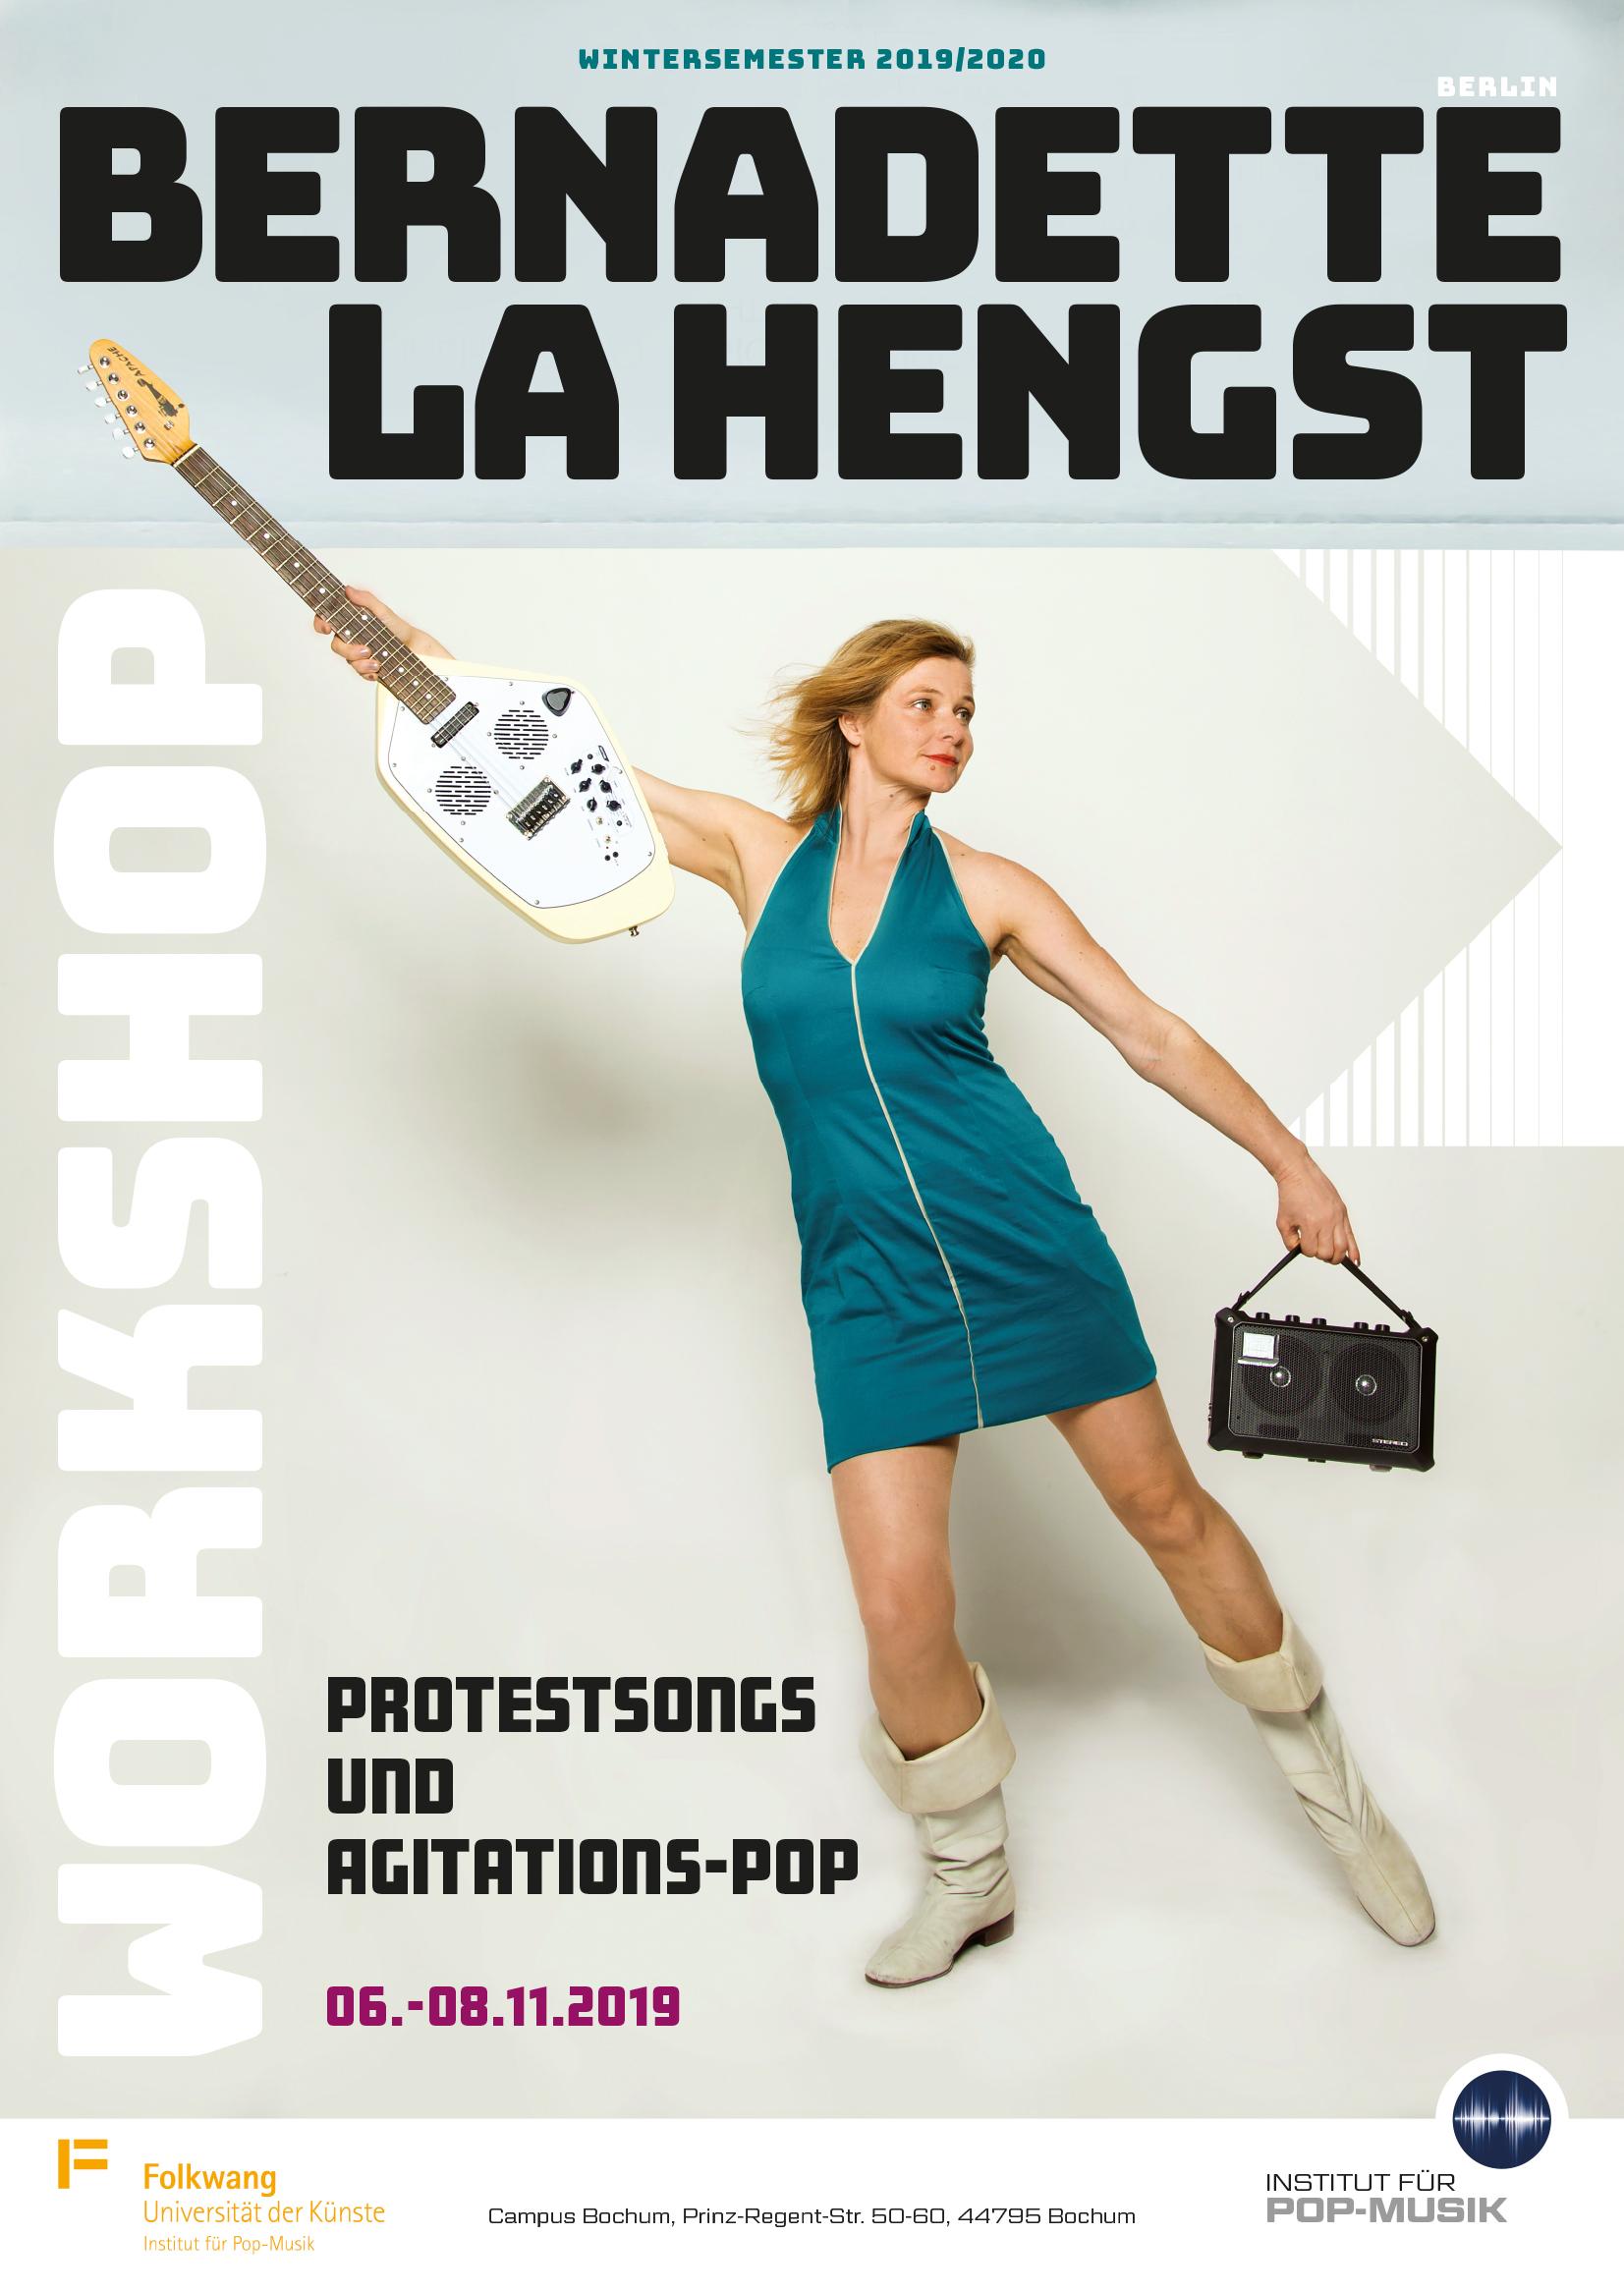 Bernadette La Hengst - Protestsongs und Agitationspop